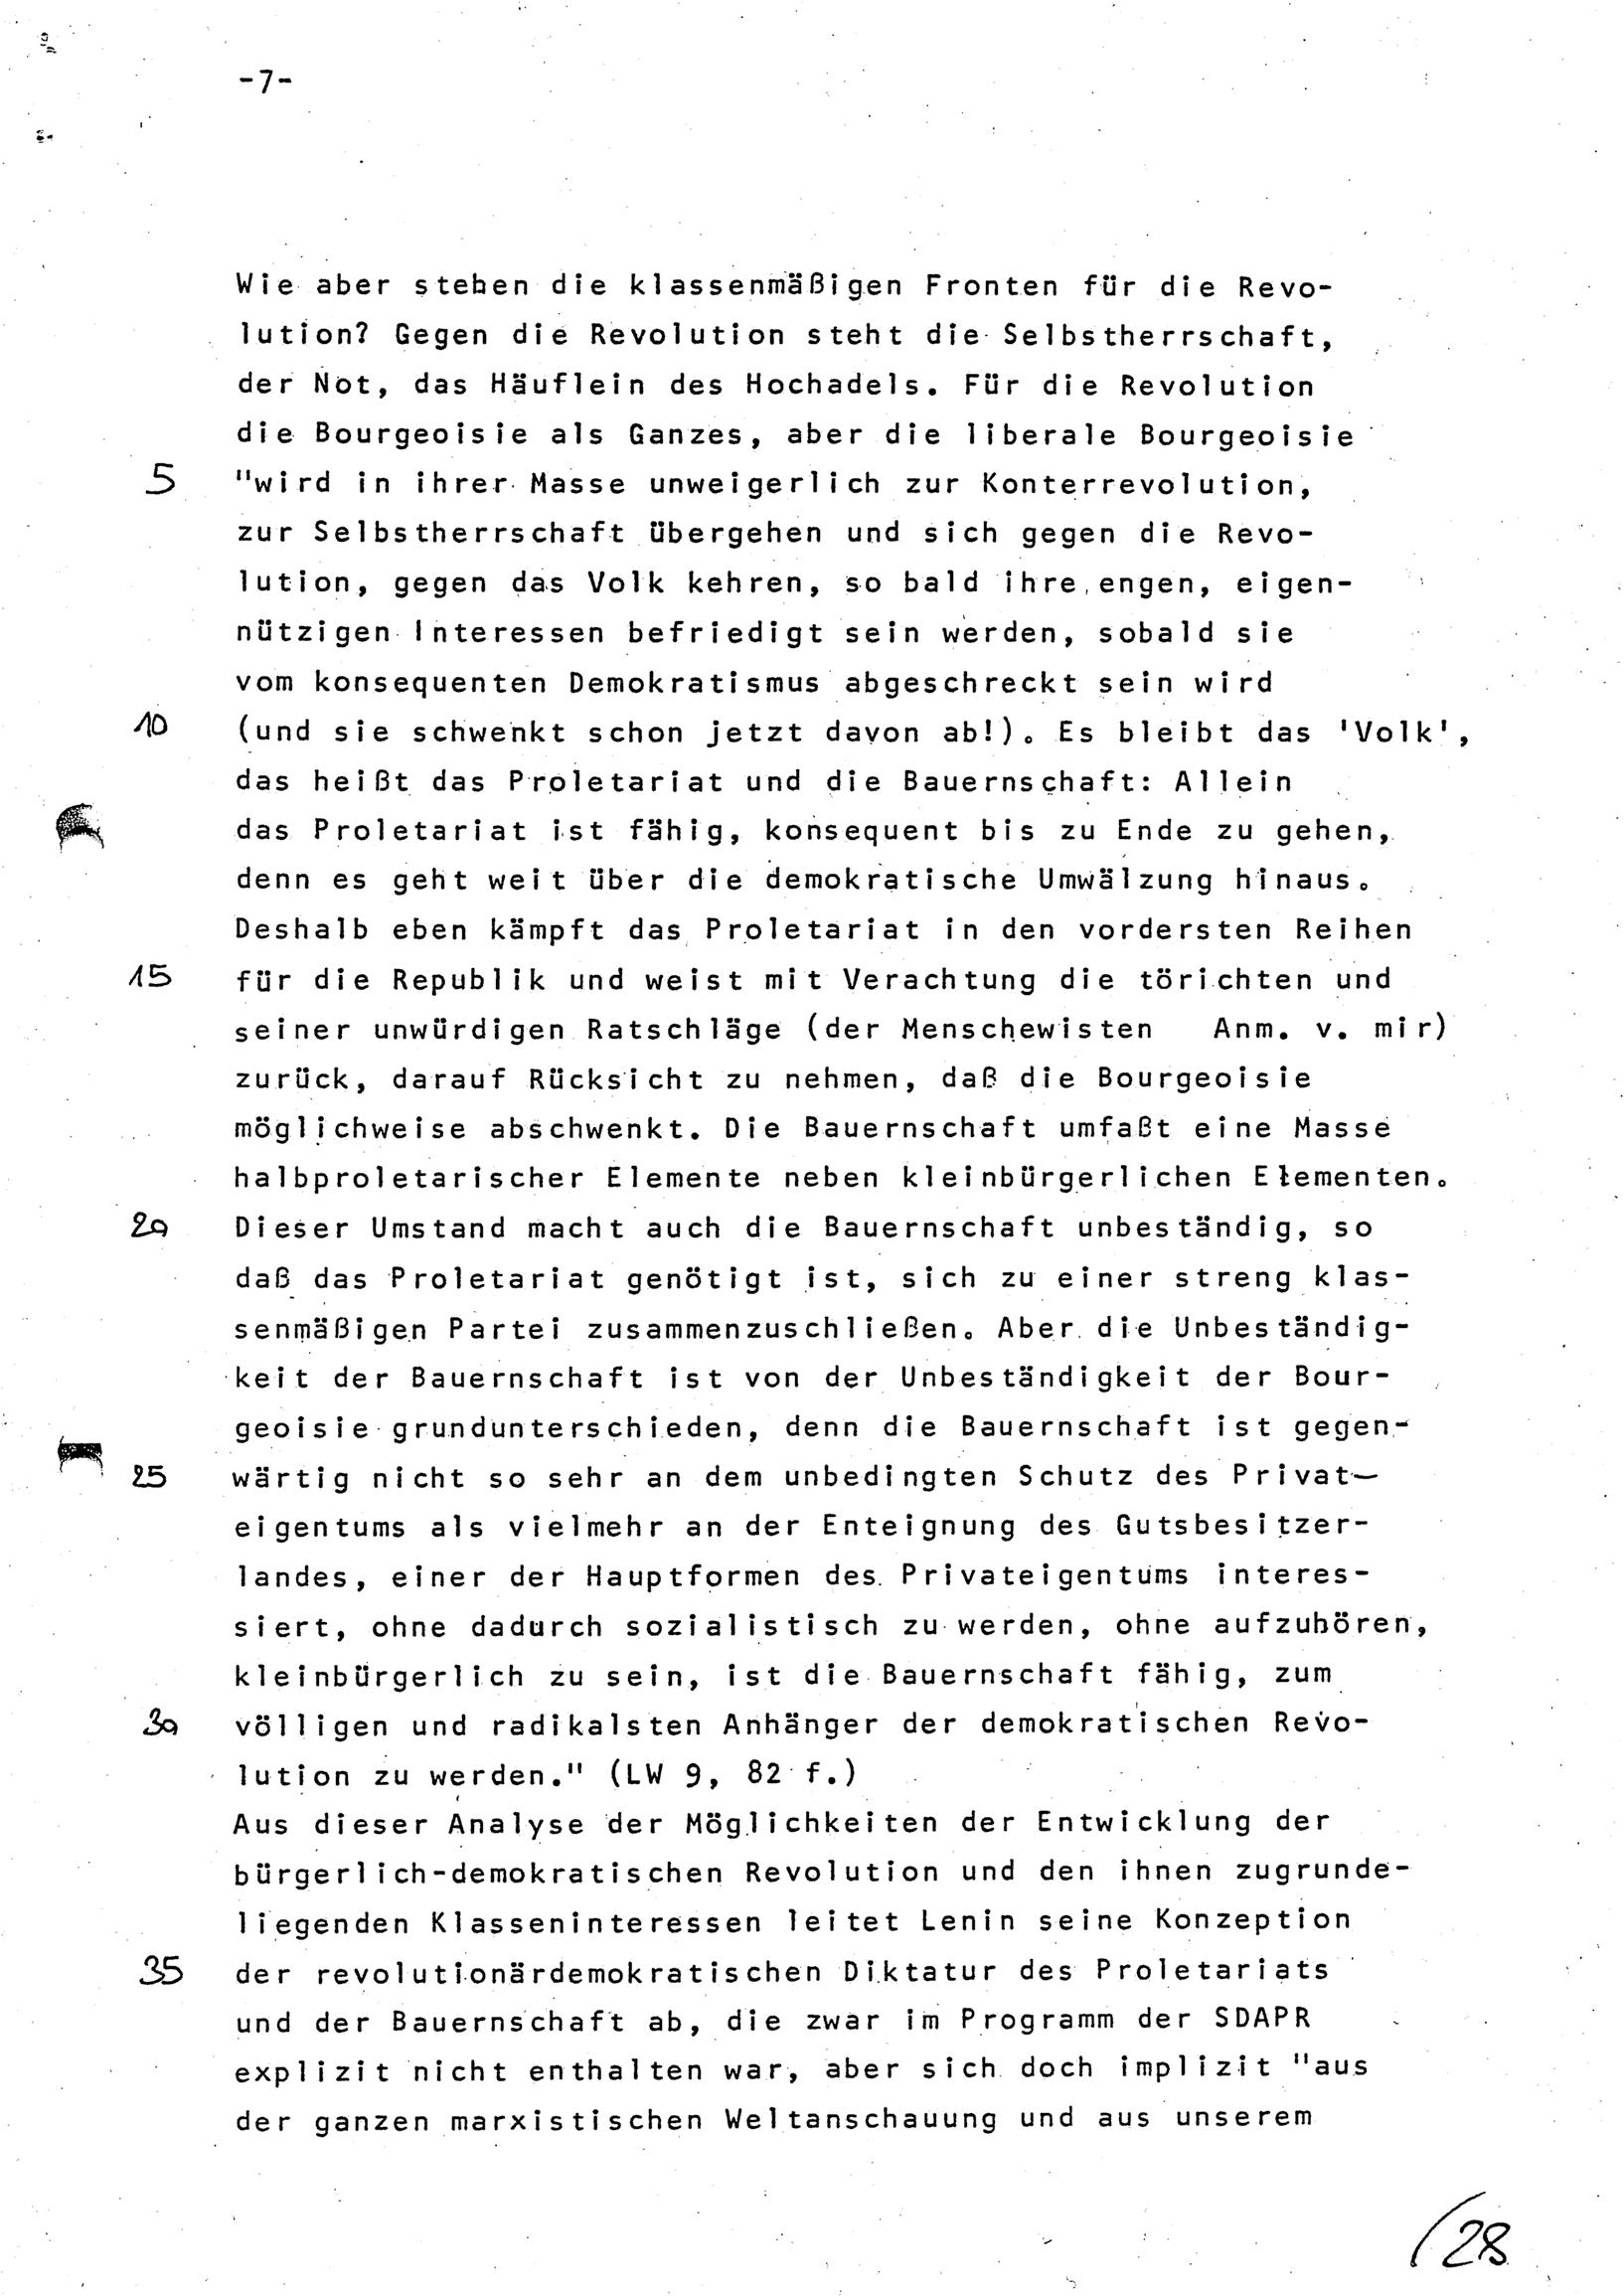 Ulm_KGU_Arbeitsheft_19830425_015_031